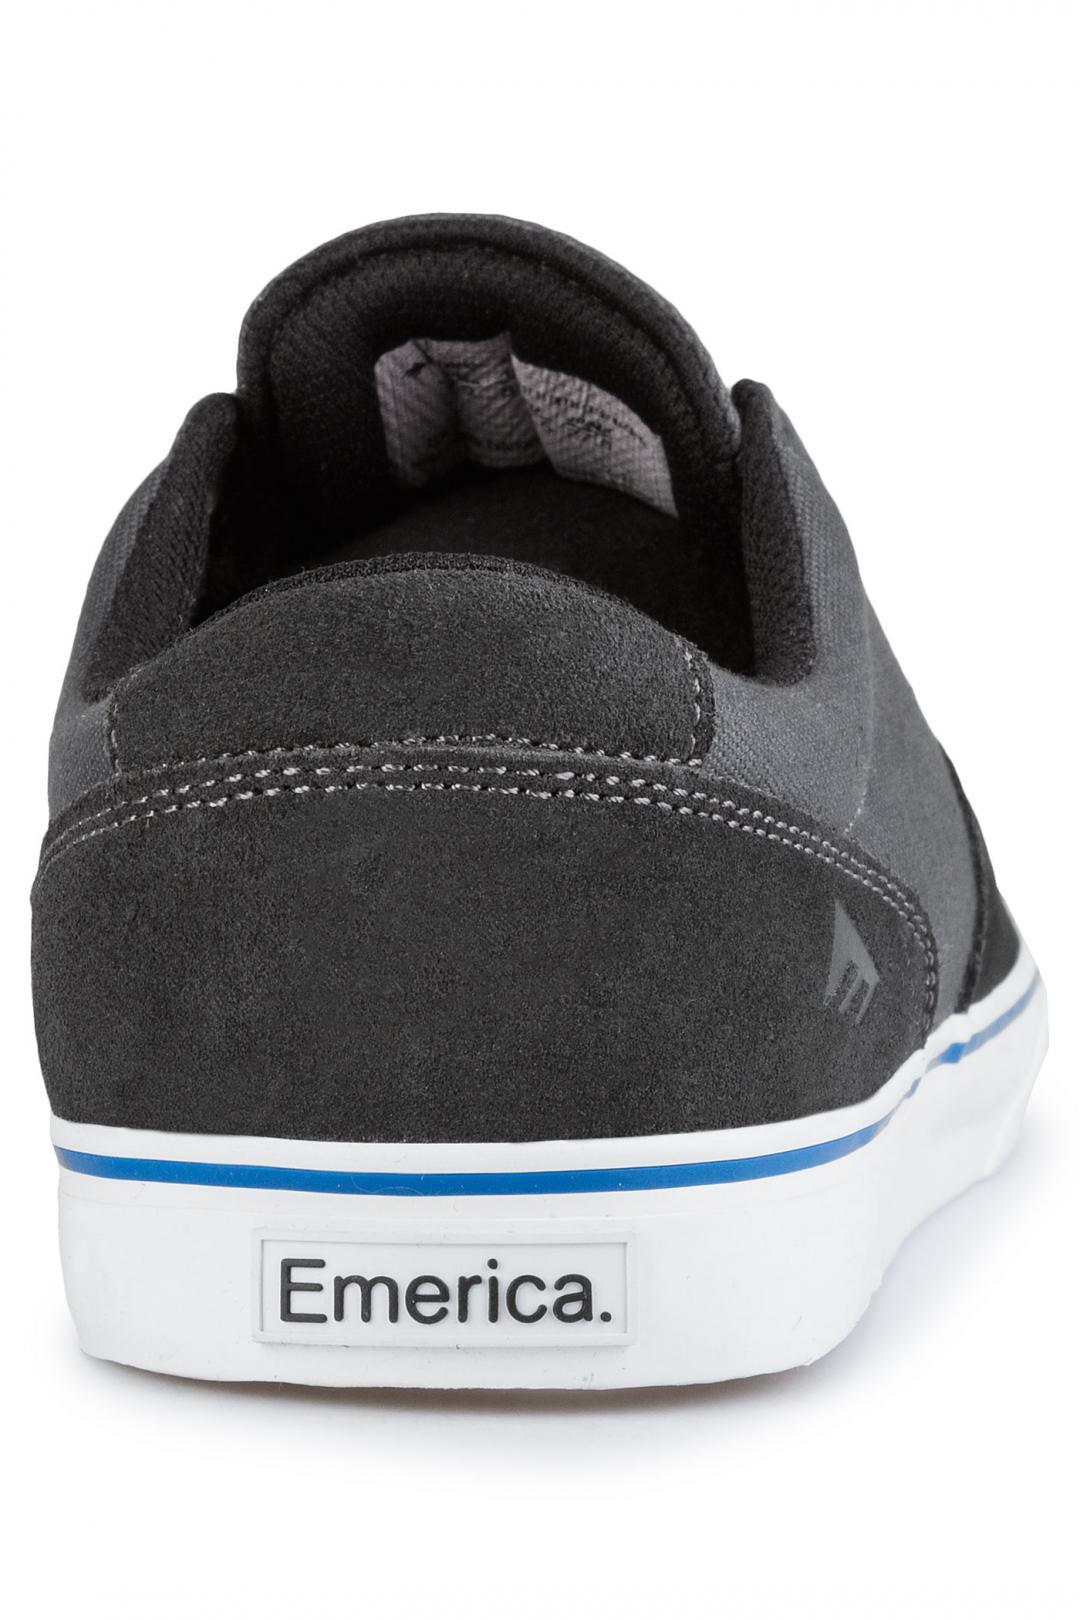 Uomo Emerica x Toy Machine The Provost Slim Vulc black grey   Scarpe da skate